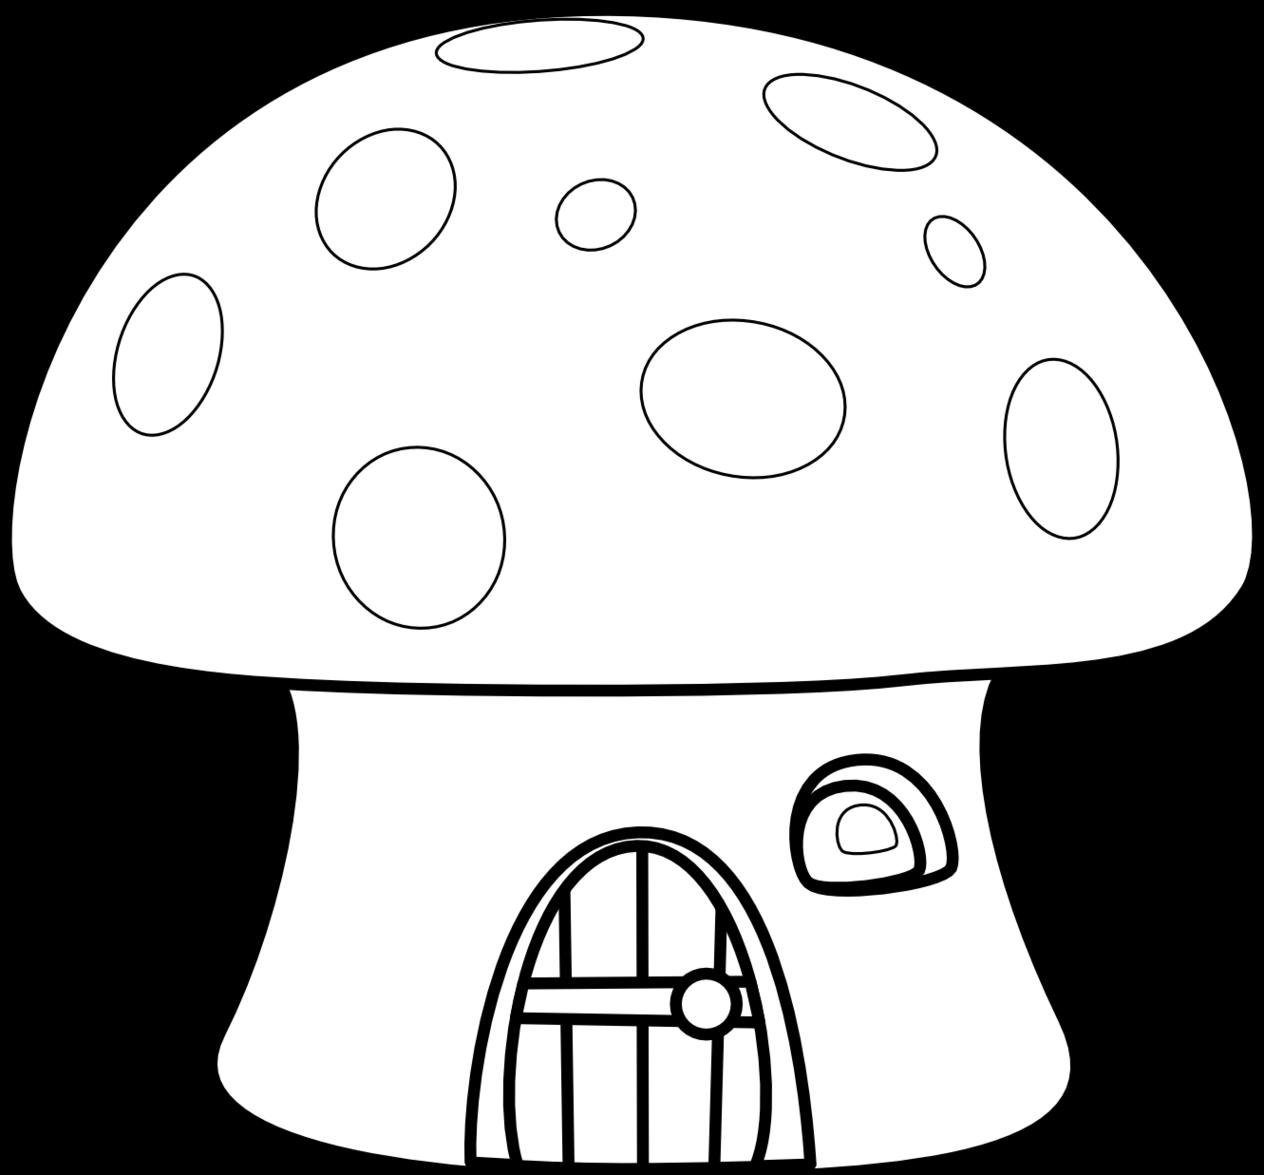 Mushroom house clipart clipart royalty free download 28+ Collection of Mushroom House Clipart Black And White | High ... clipart royalty free download